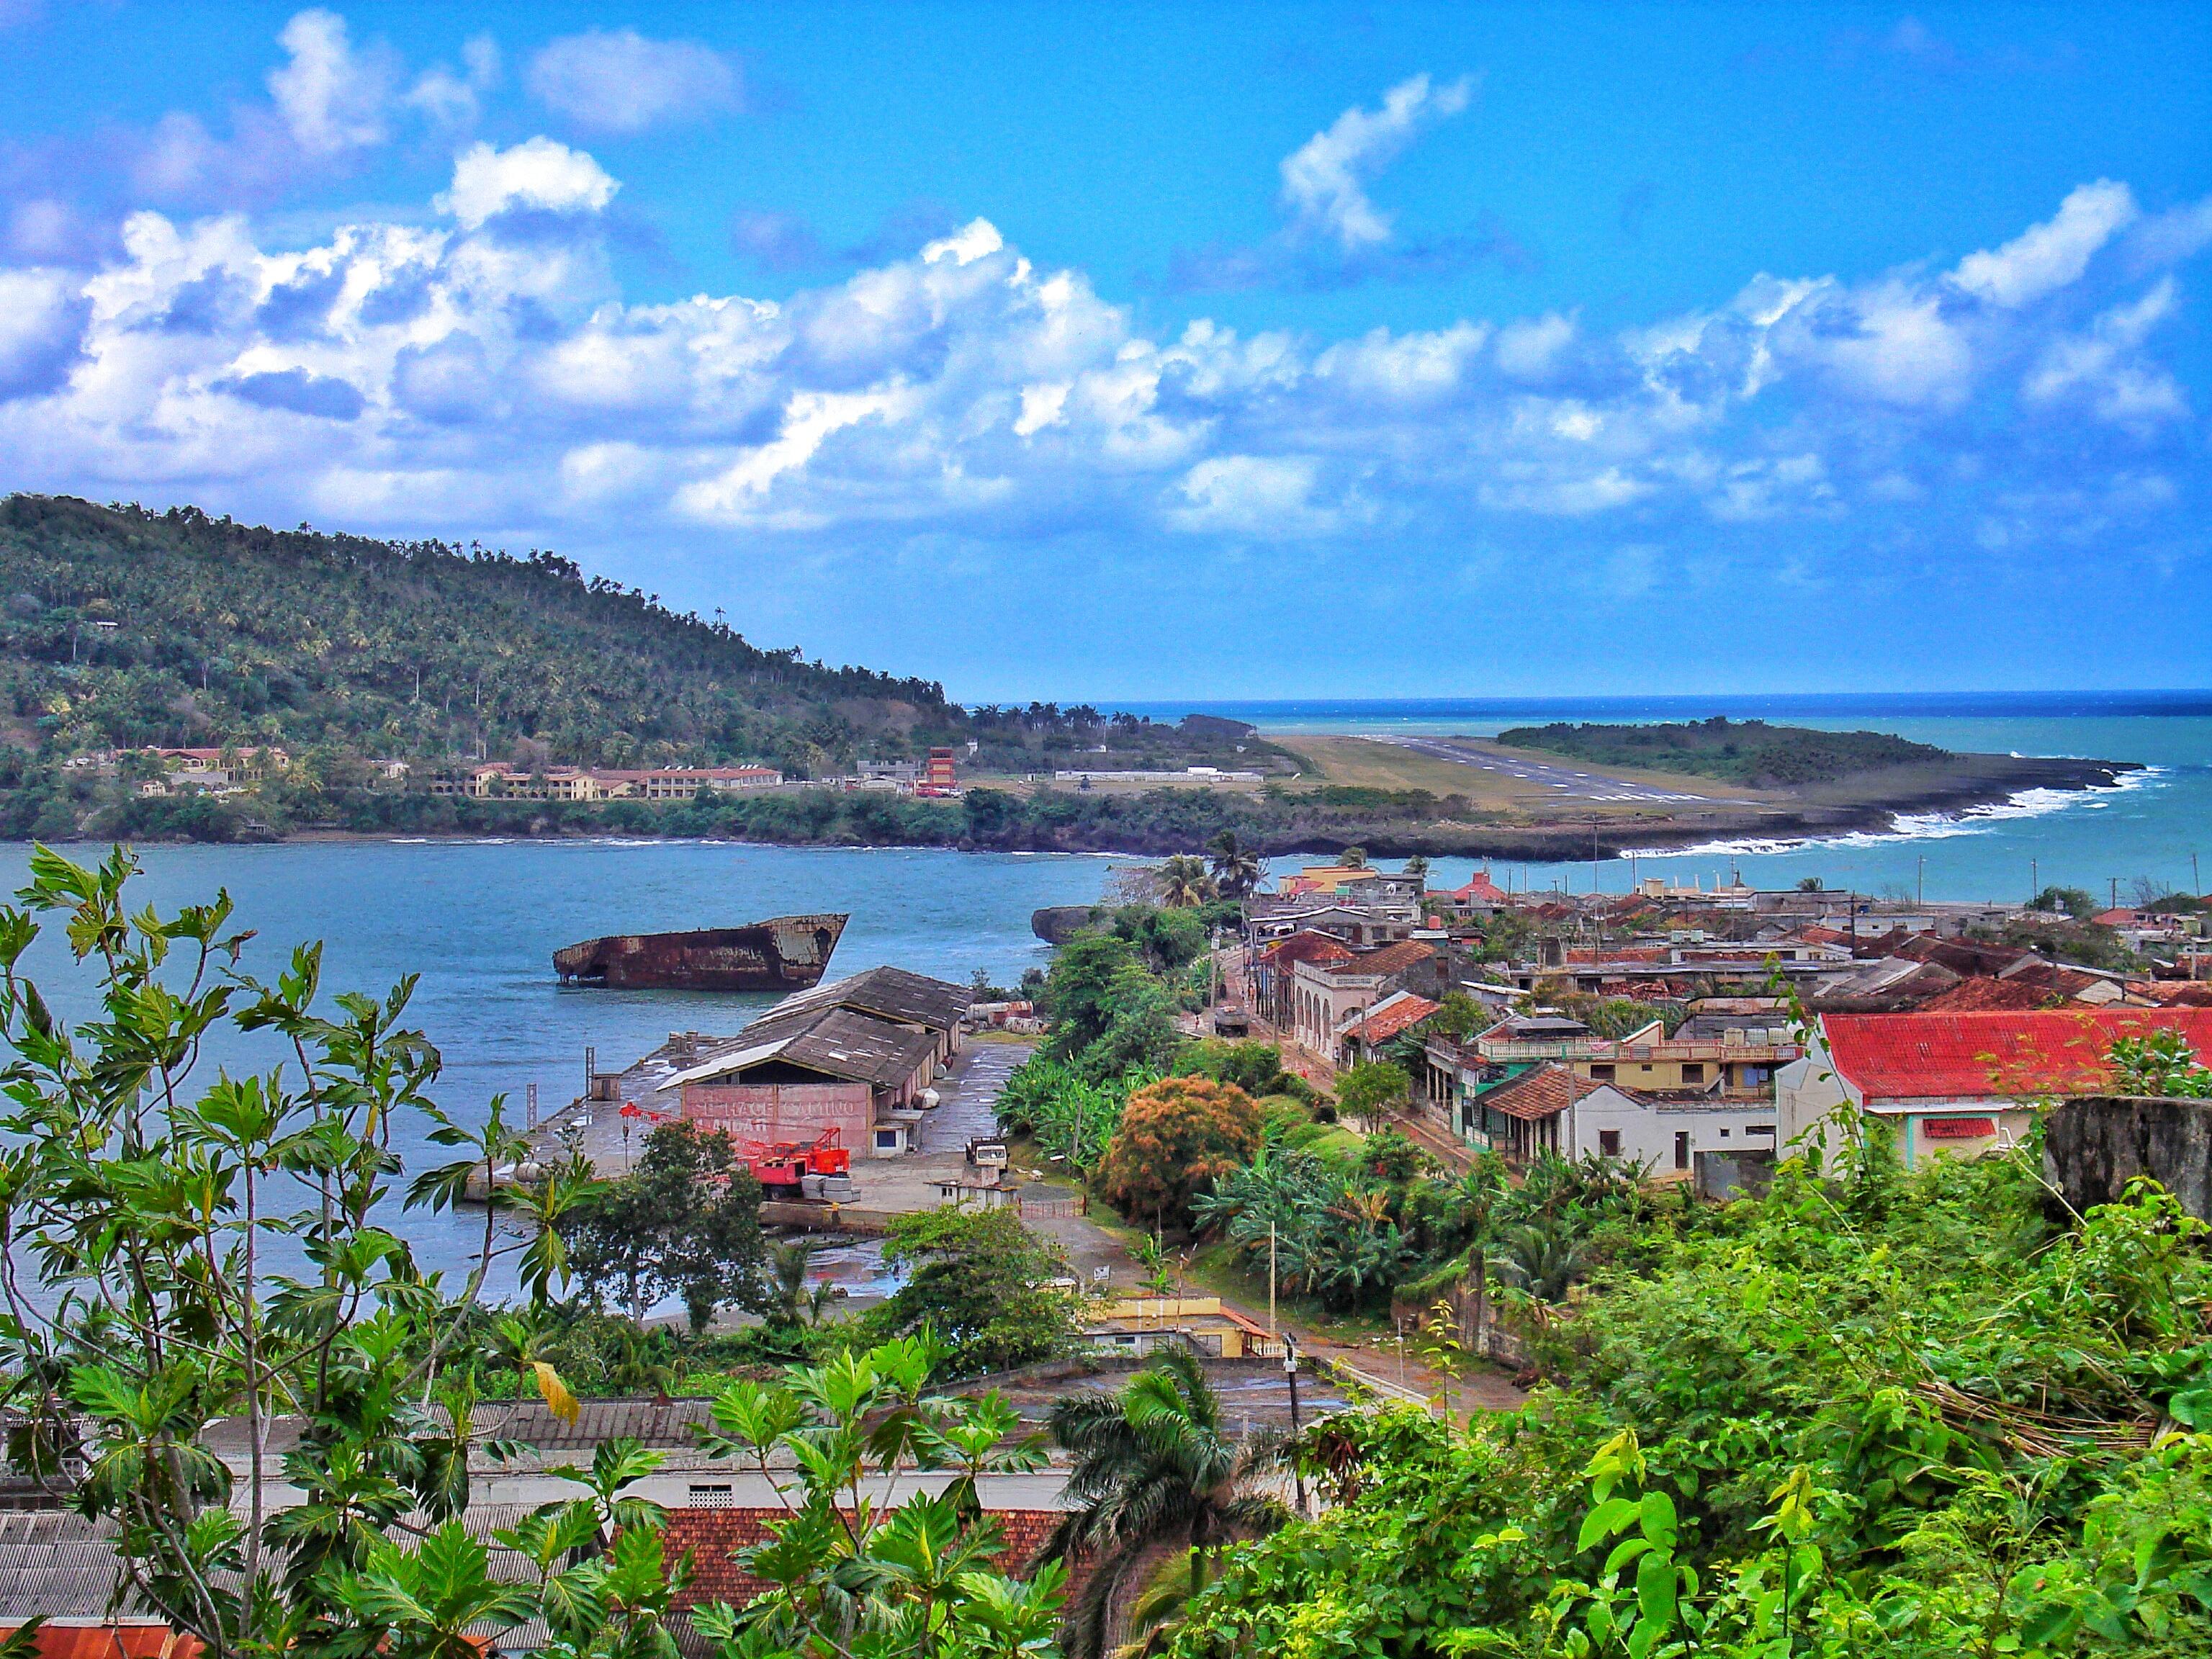 Find real Cuban authenticity at Baracoa - WORLD WANDERISTA